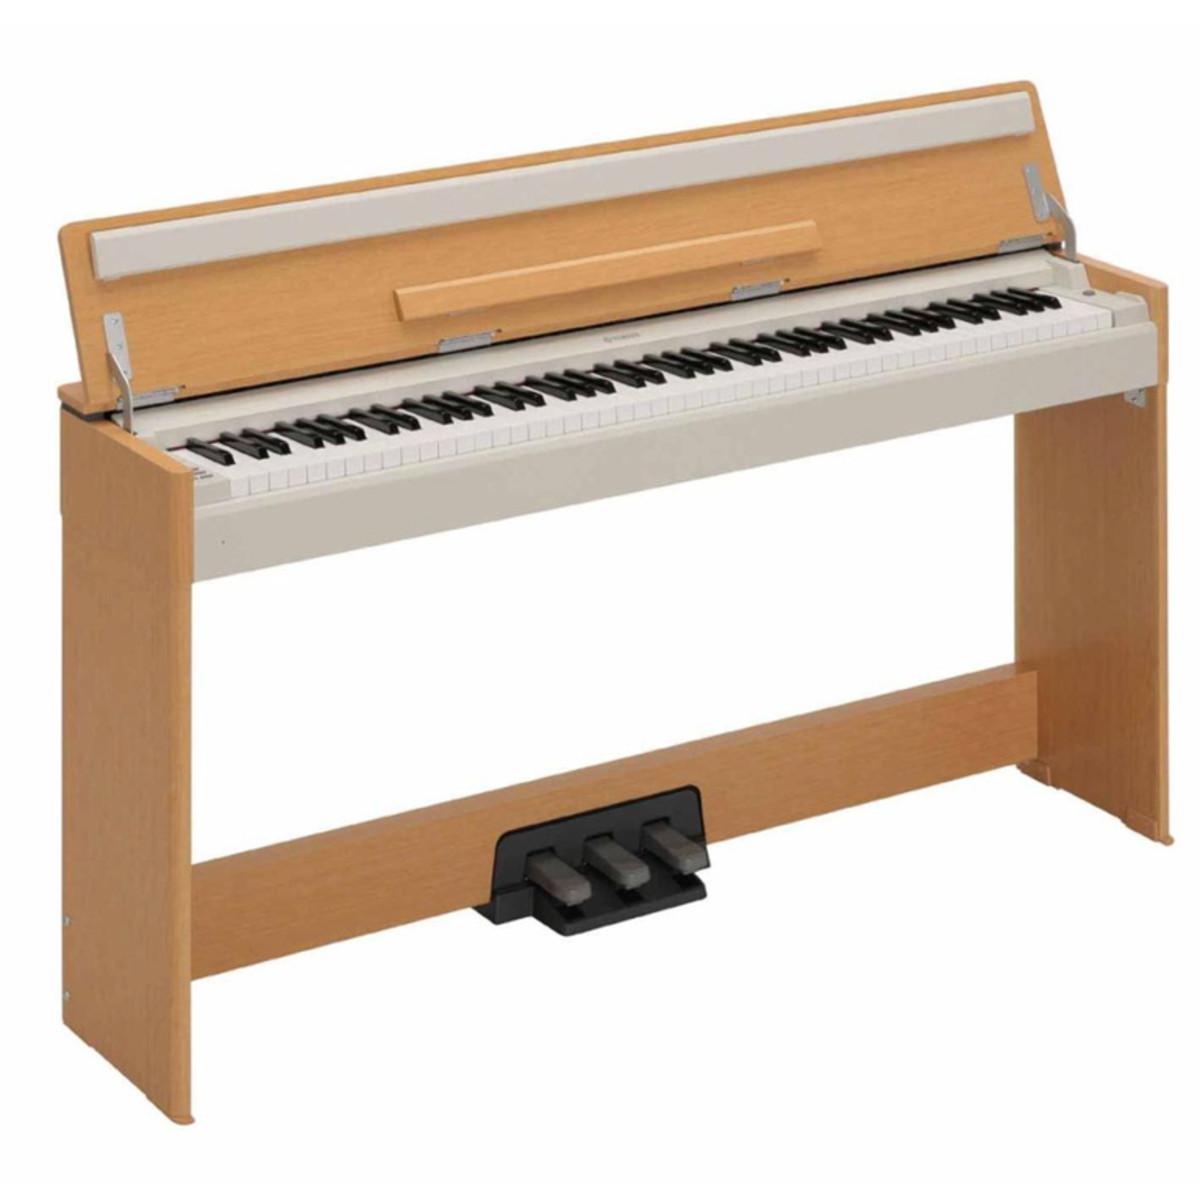 Platen yamaha ydp s30 digital piano cherry hos for Yamaha dgx640c digital piano cherry